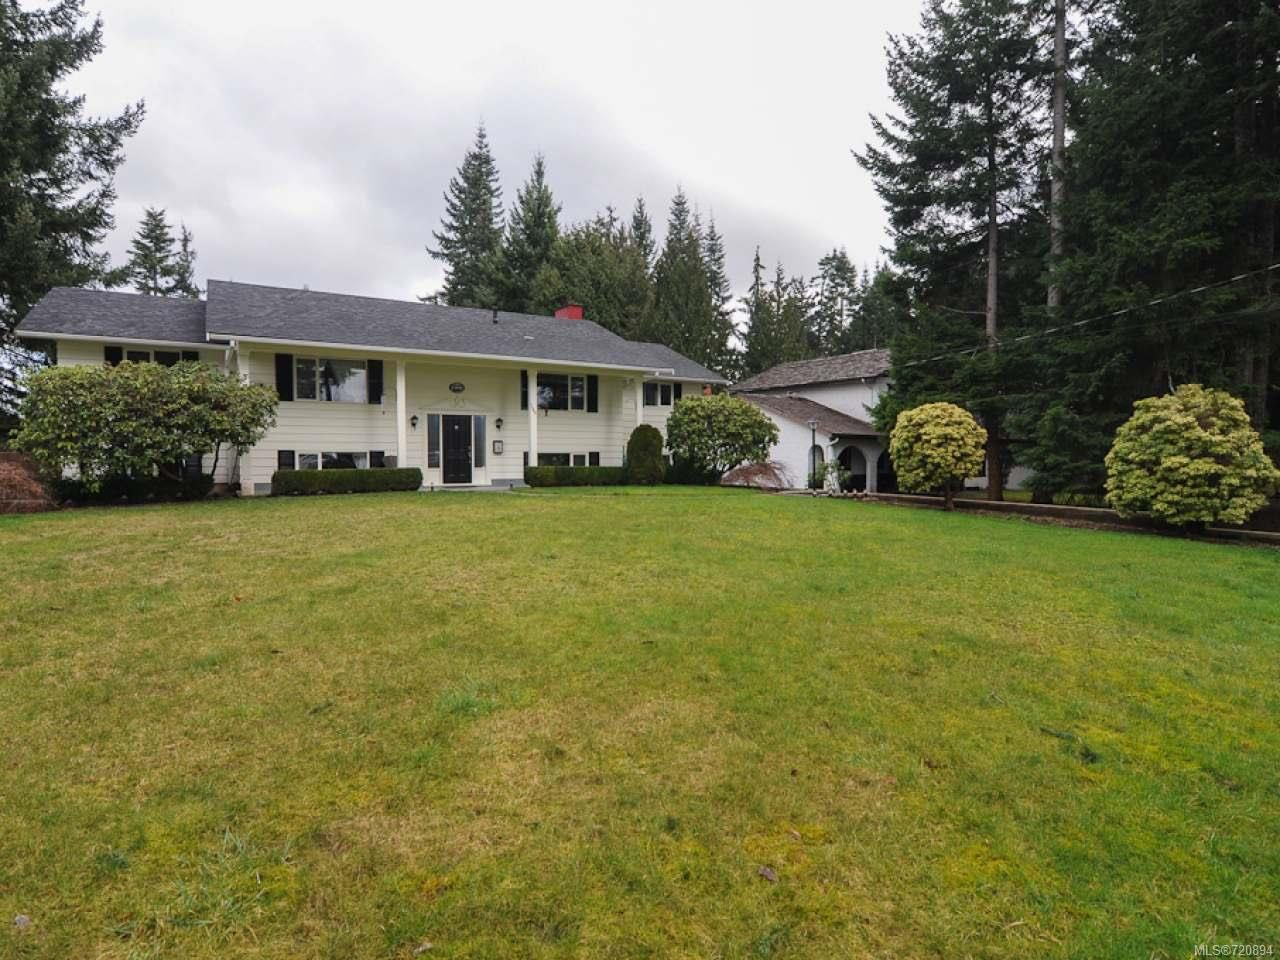 Main Photo: 1460 Glen Urquhart Dr in COURTENAY: CV Courtenay East House for sale (Comox Valley)  : MLS®# 720894